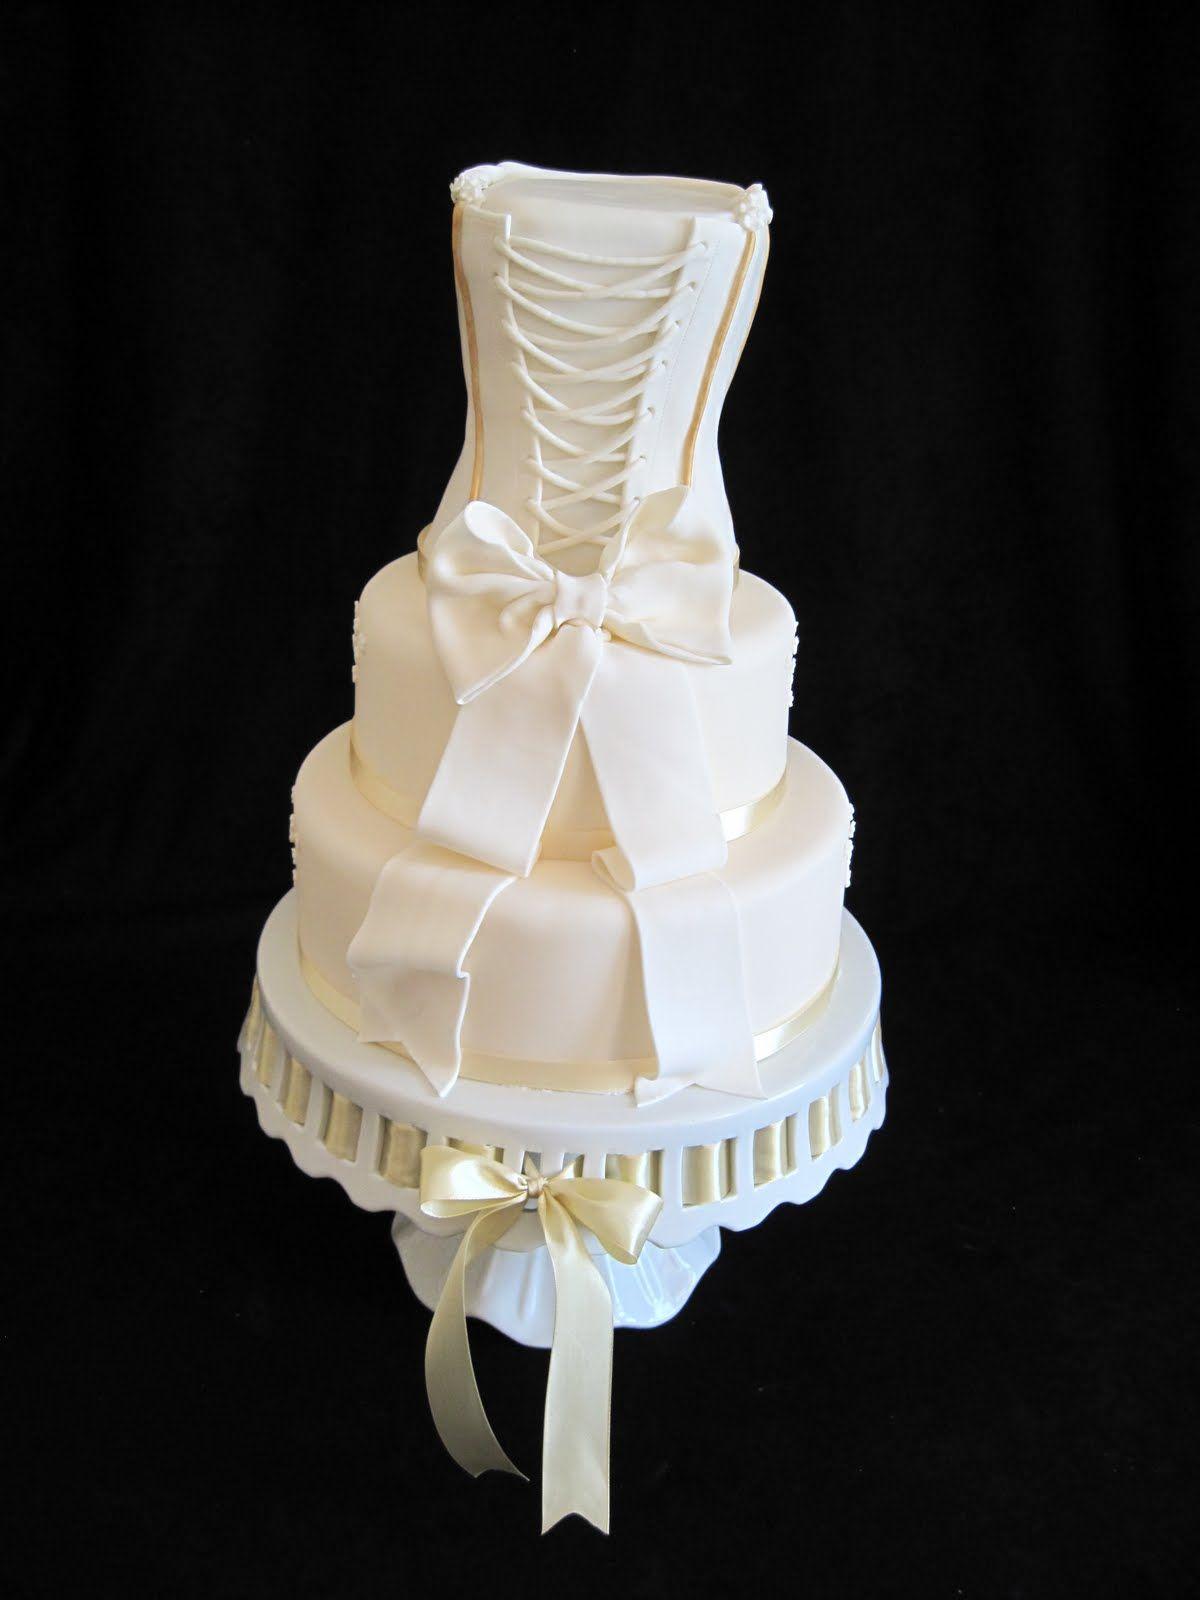 White Dress Cake ~ beautiful!   wedding <3   Pinterest   Dress cake ...